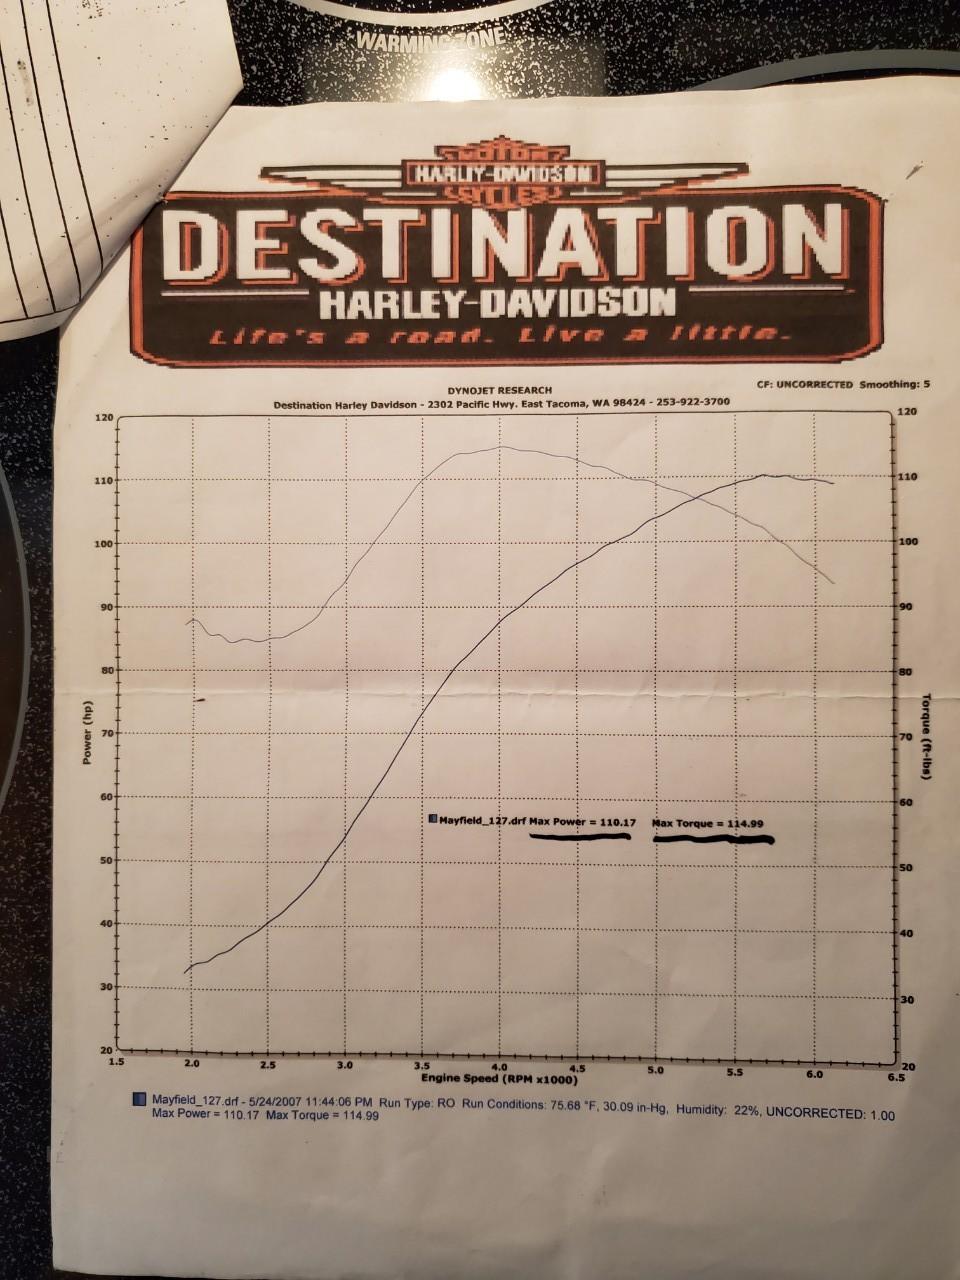 Washington - Road King For Sale - Harley--Davidson Motorcycles